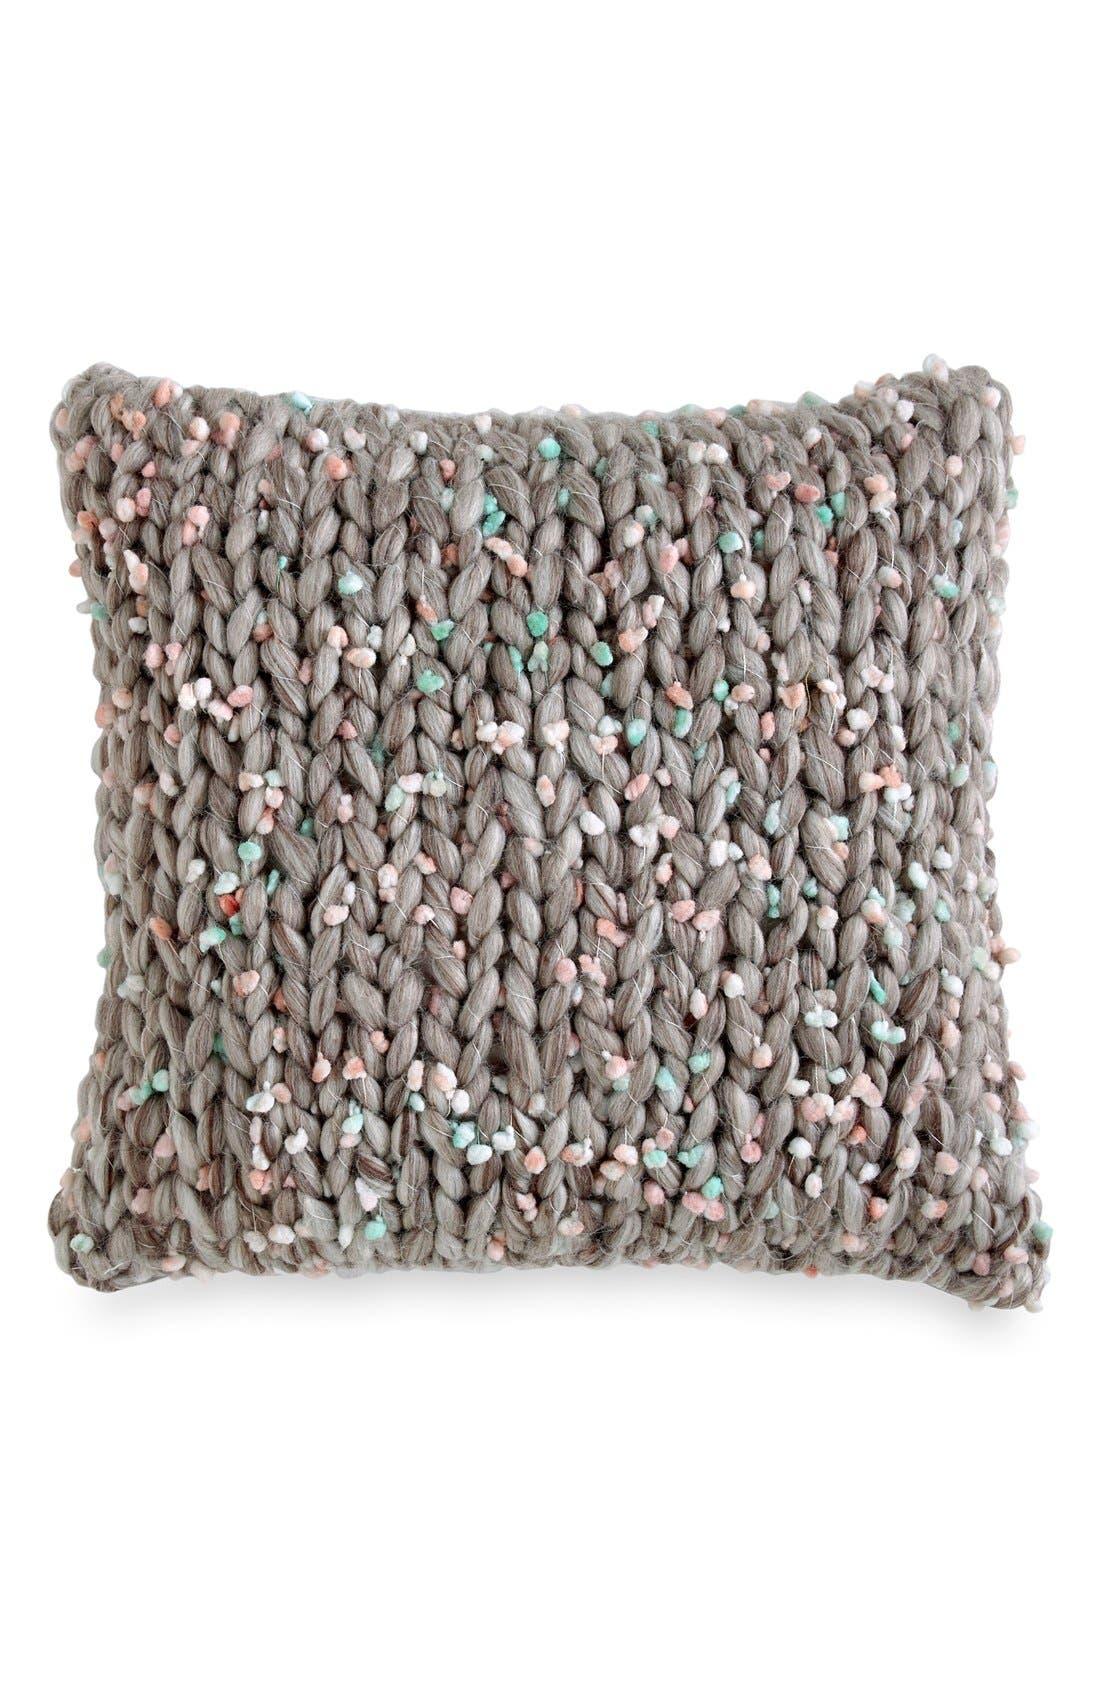 DKNY 'Mode' Pillow